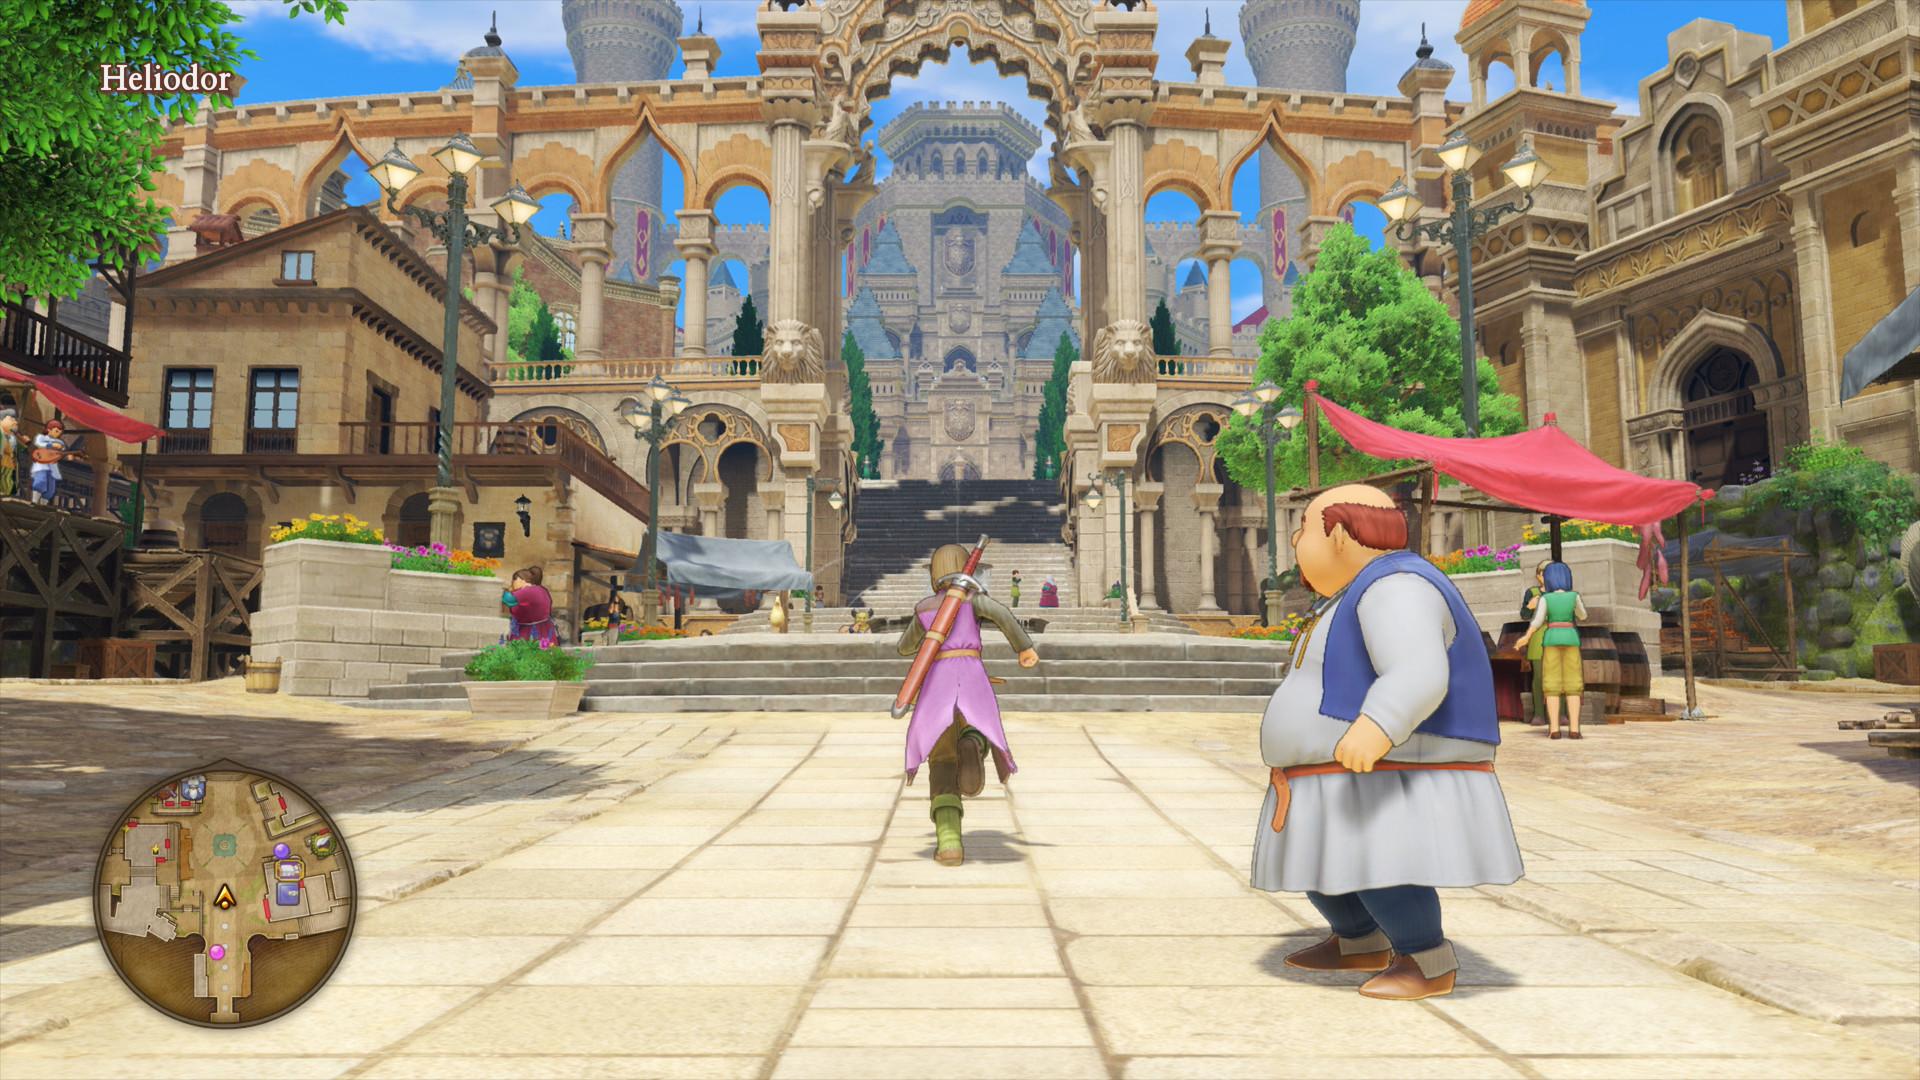 Dragon Quest XI: Echoes of an Elusive Age Screenshot 1